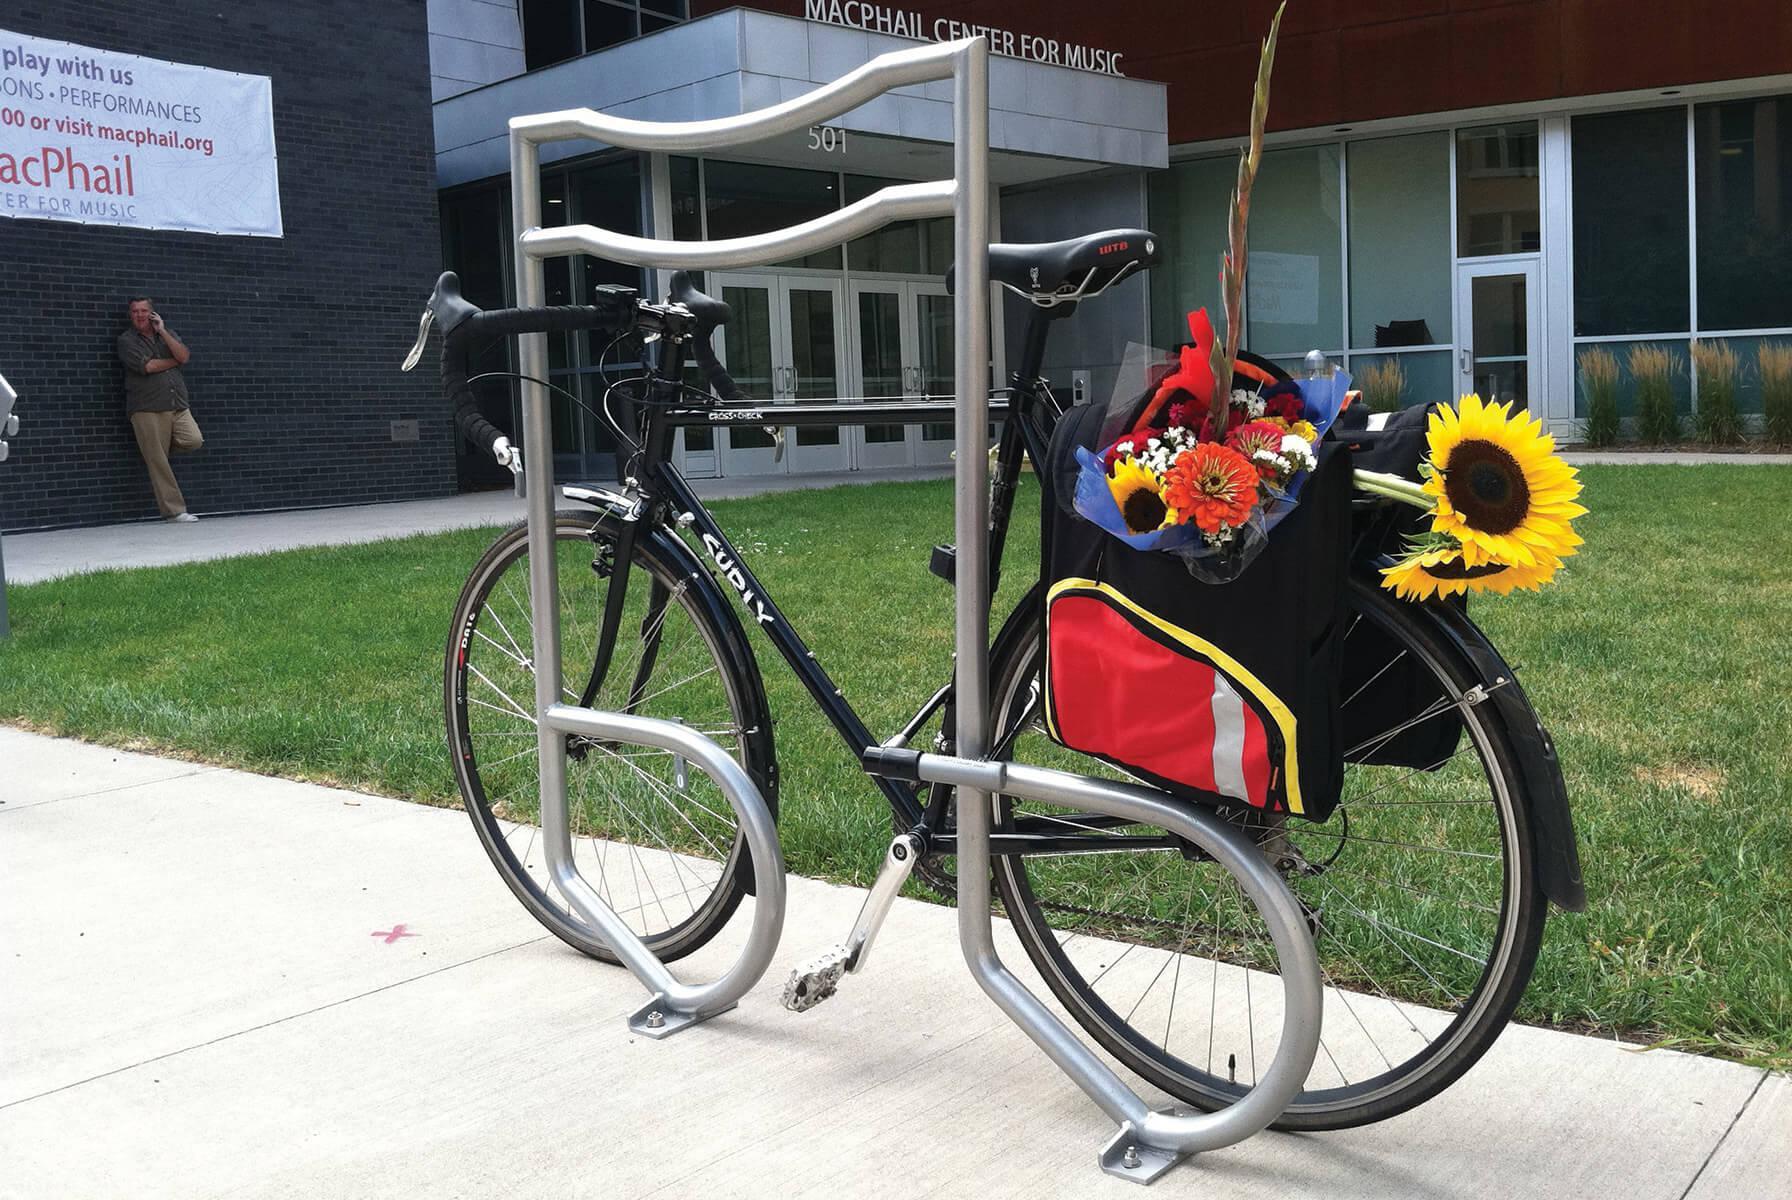 Music-Note-Bike-Rack.jpg#asset:12642